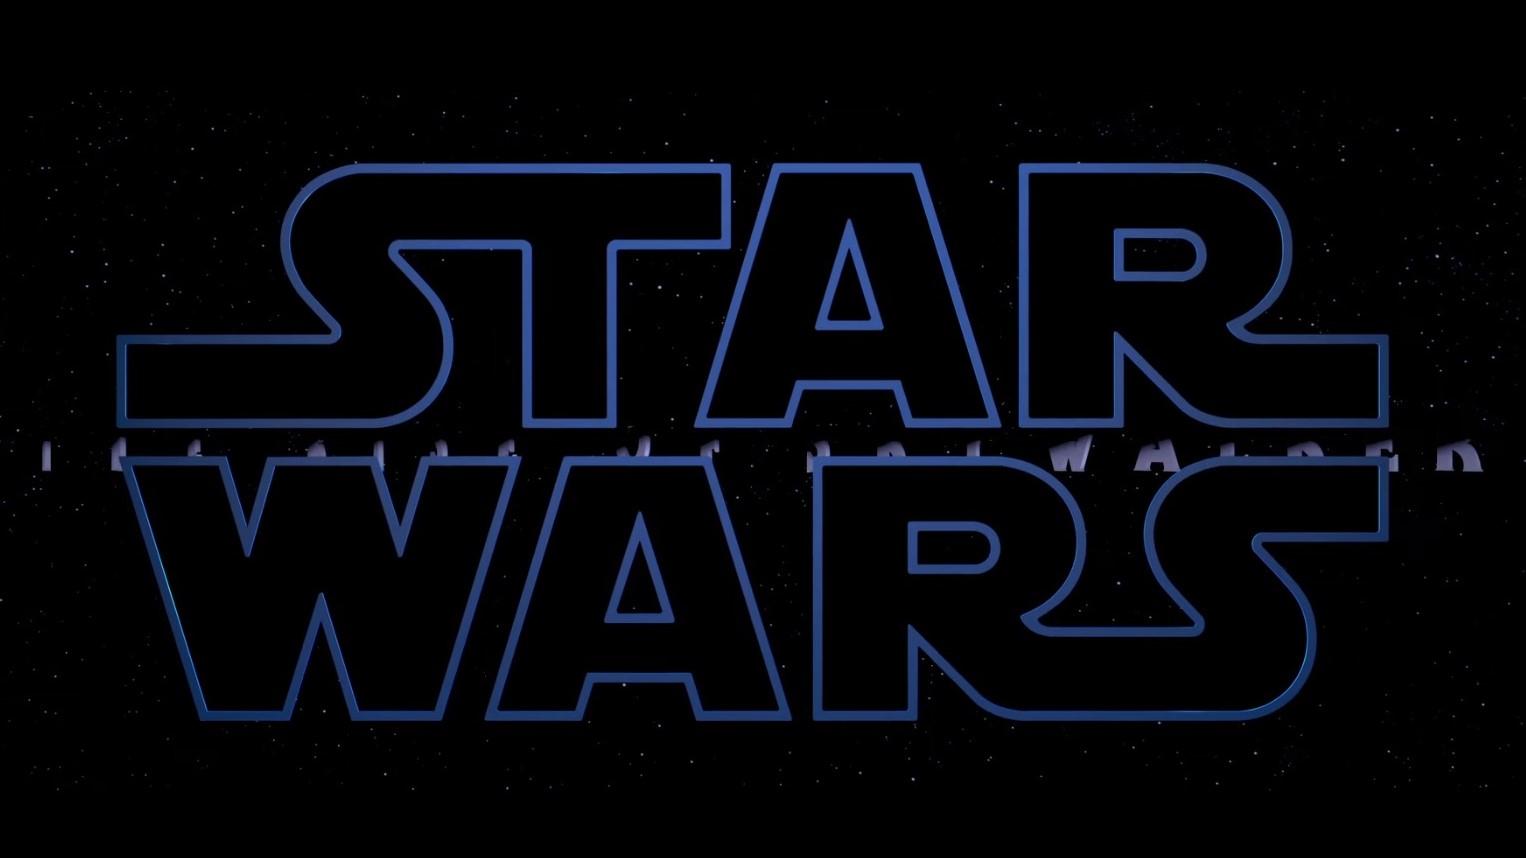 Star Wars Episode IX now has a proper name